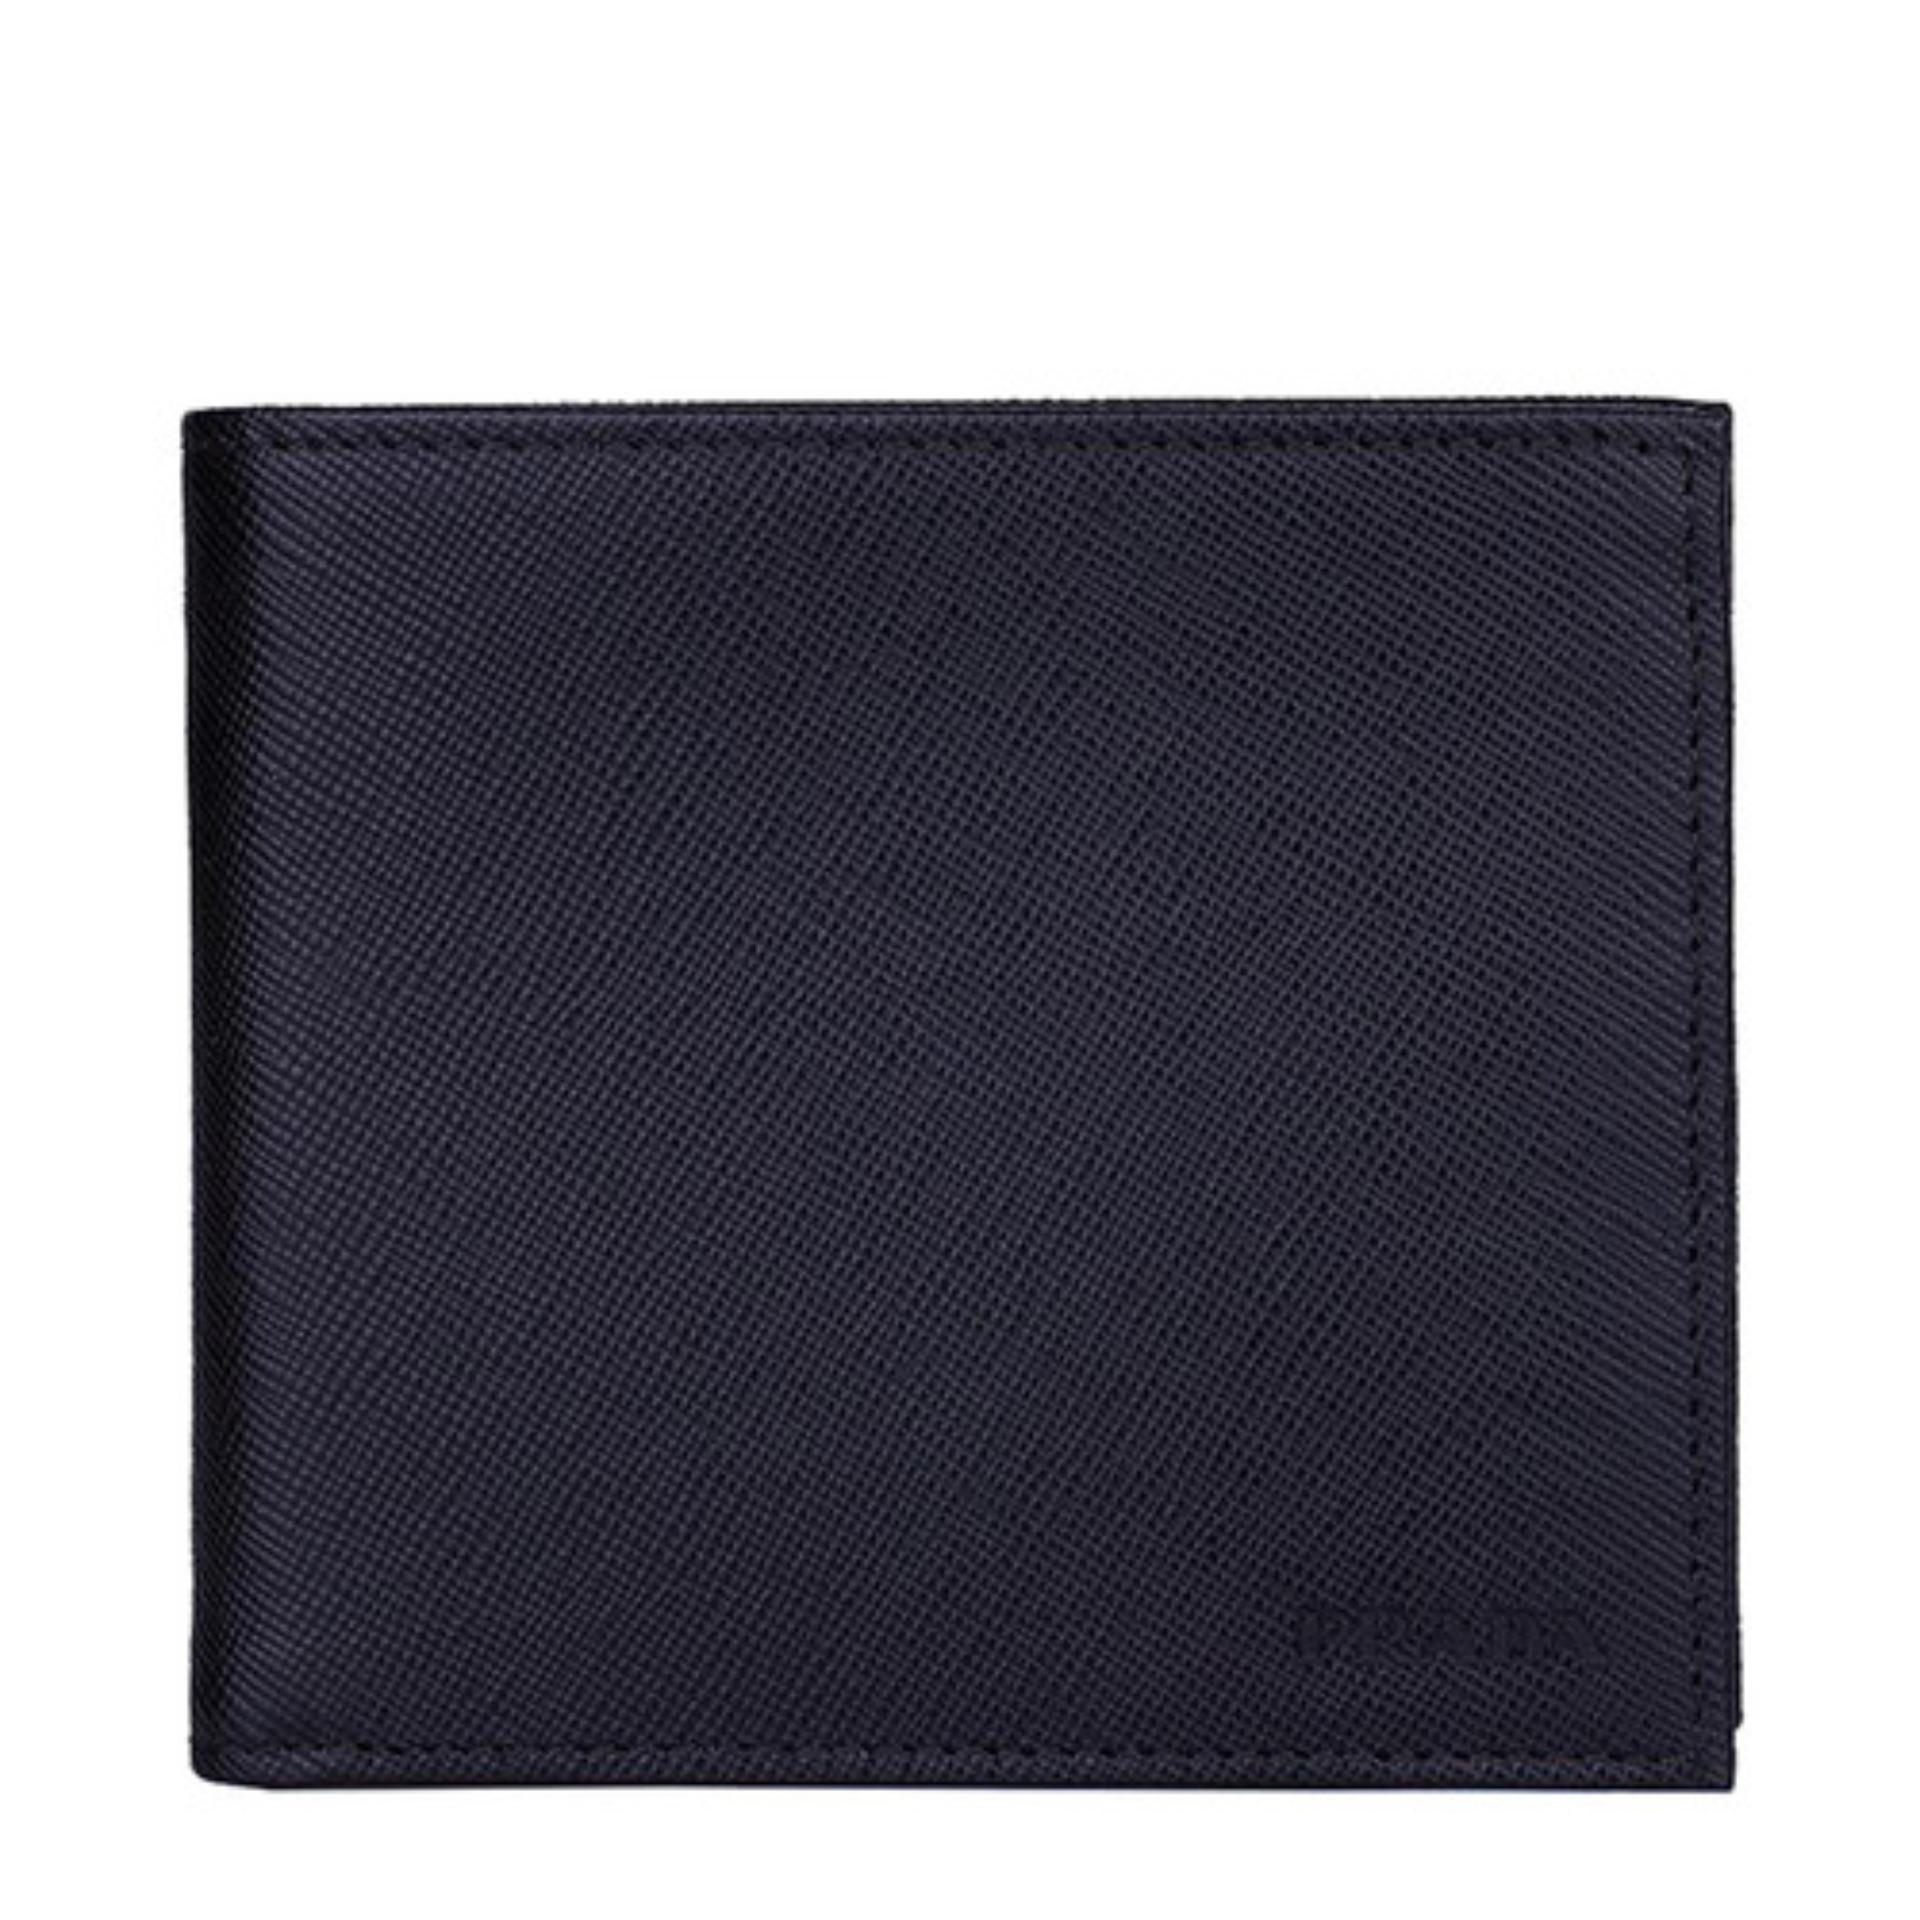 667aa06dca4bd4 Latest Prada Men Fashion Wallets Products | Enjoy Huge Discounts ...